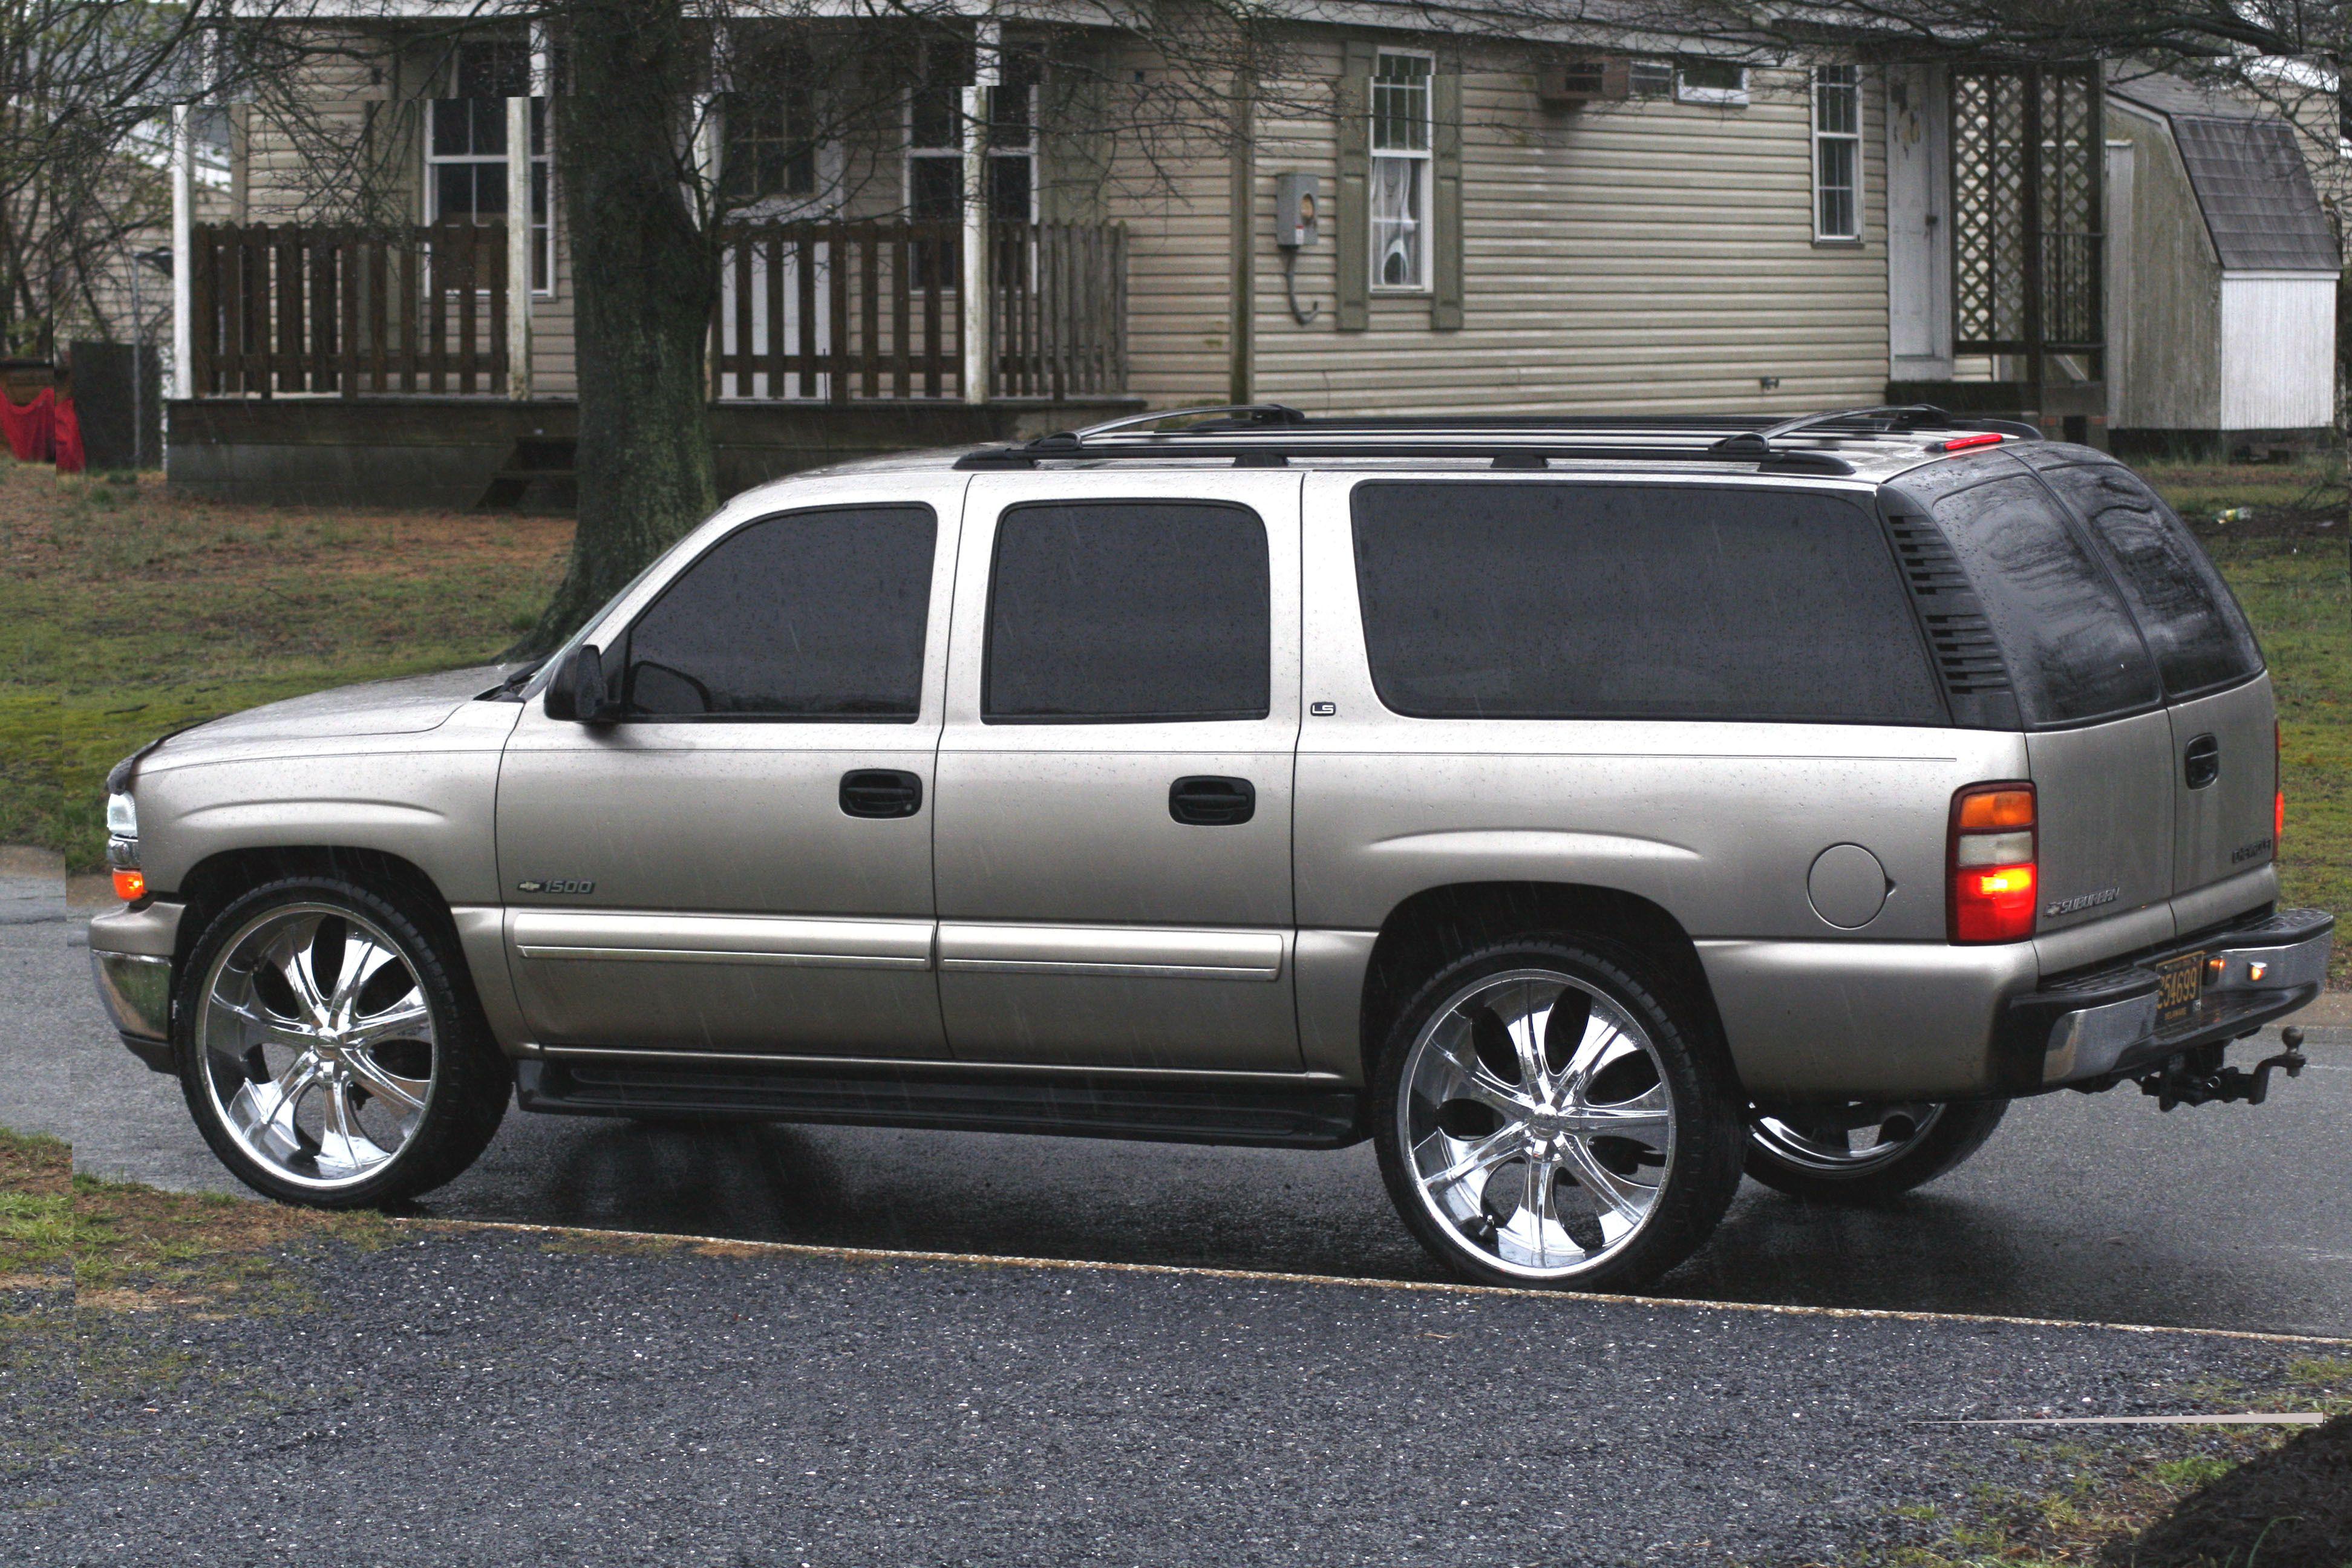 Check Out Customized Snax09 S 2000 Chevrolet Suburban 1500 Photos